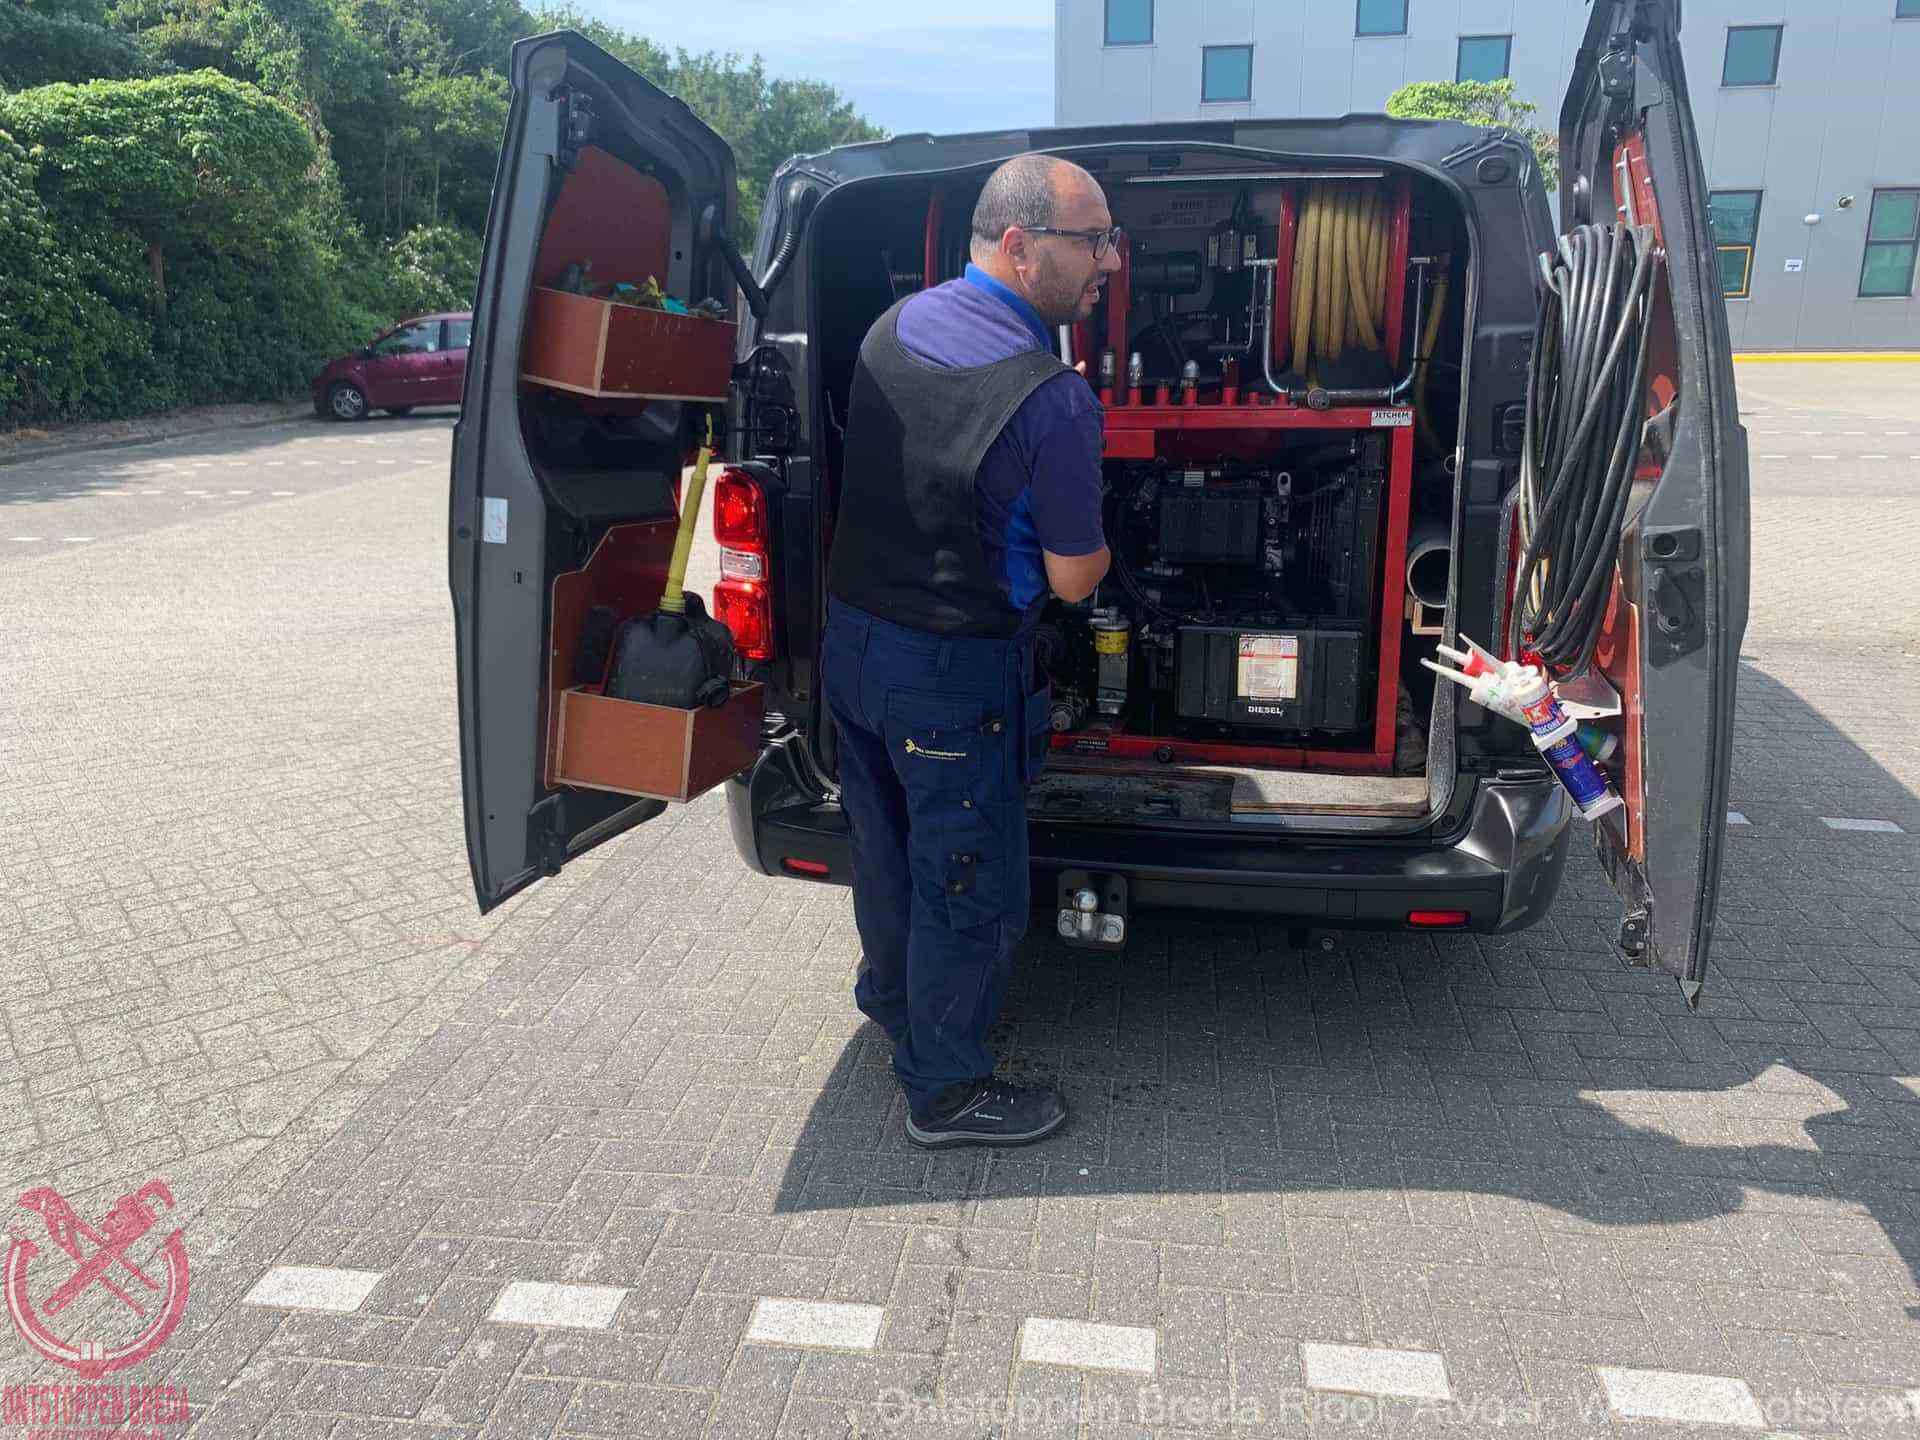 Loodgieter Breda Ontstopping